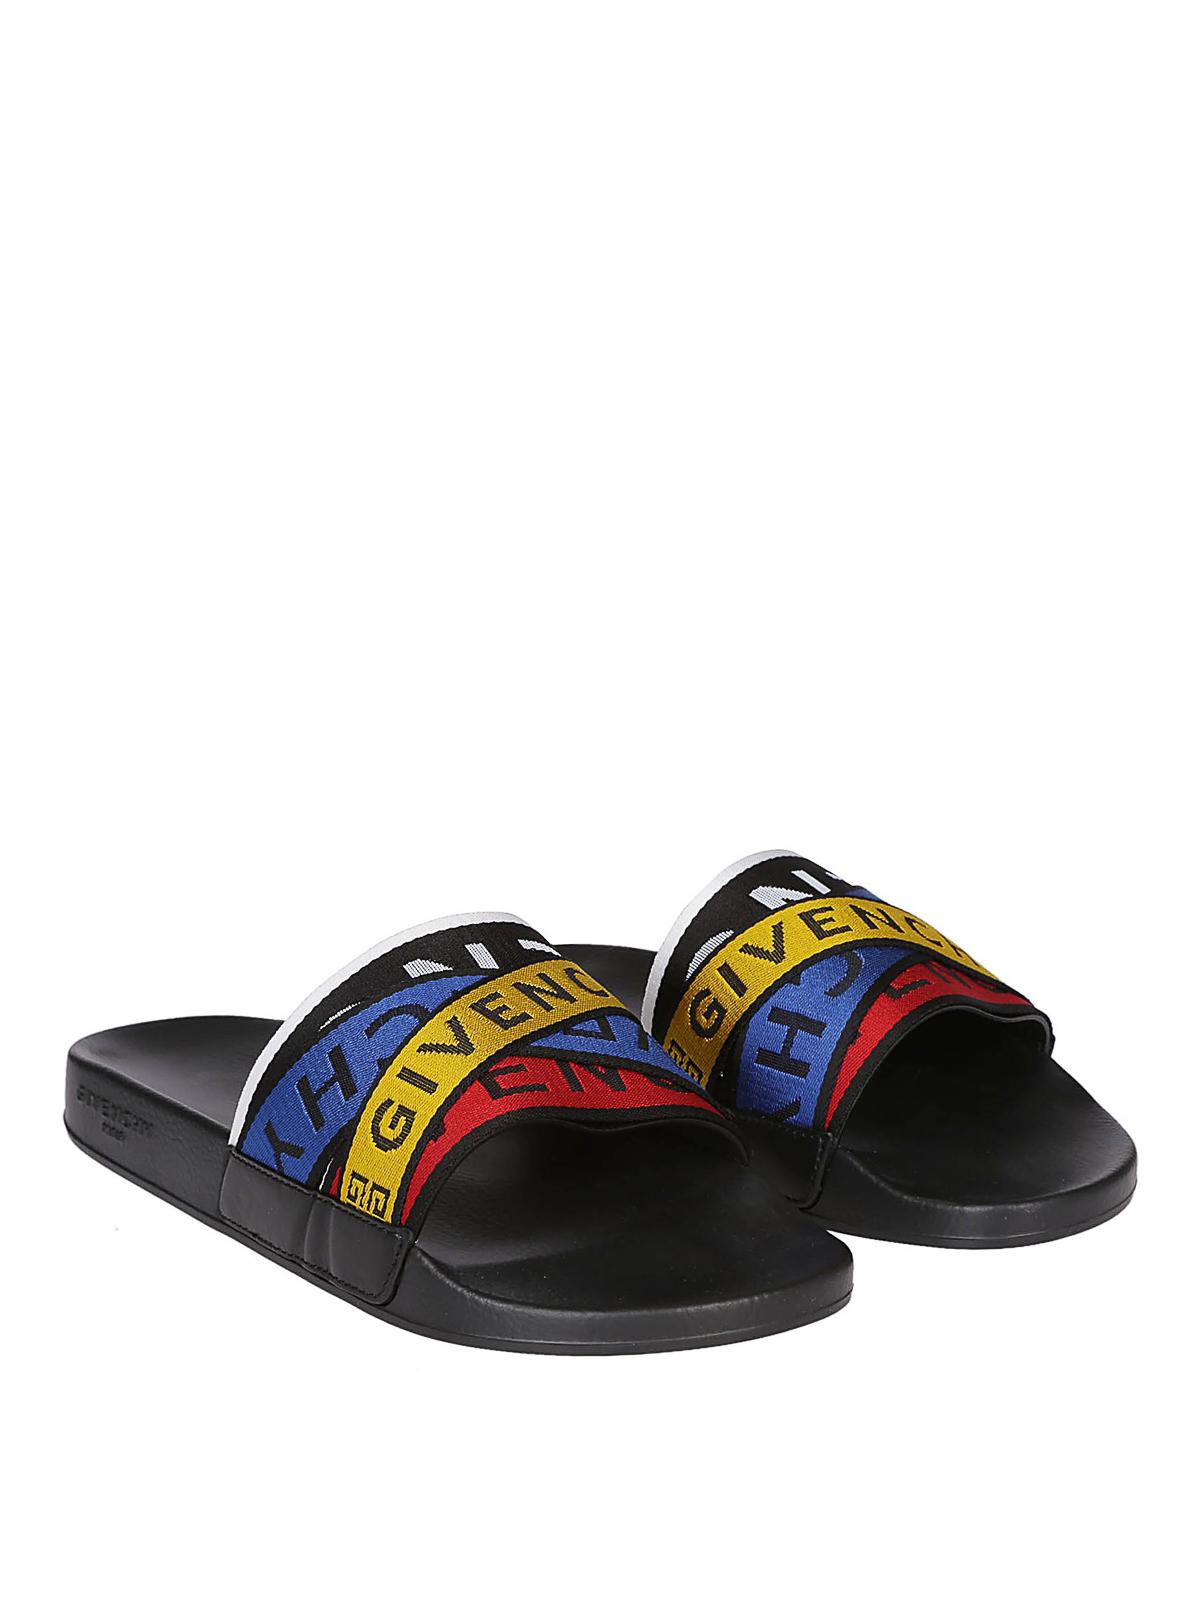 Michael Kors Slides Sandals